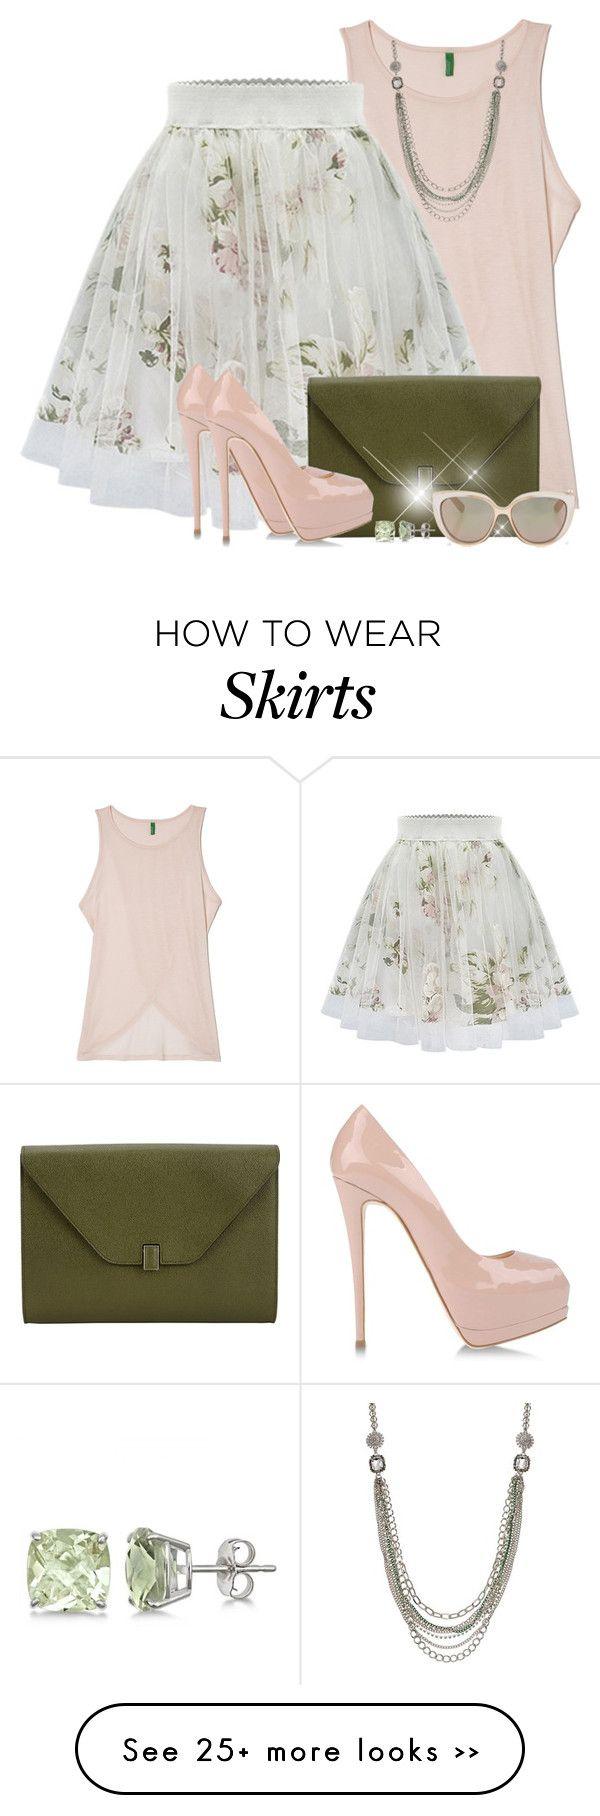 """Floral Print Skater Skirt"" by brendariley-1 on Polyvore"